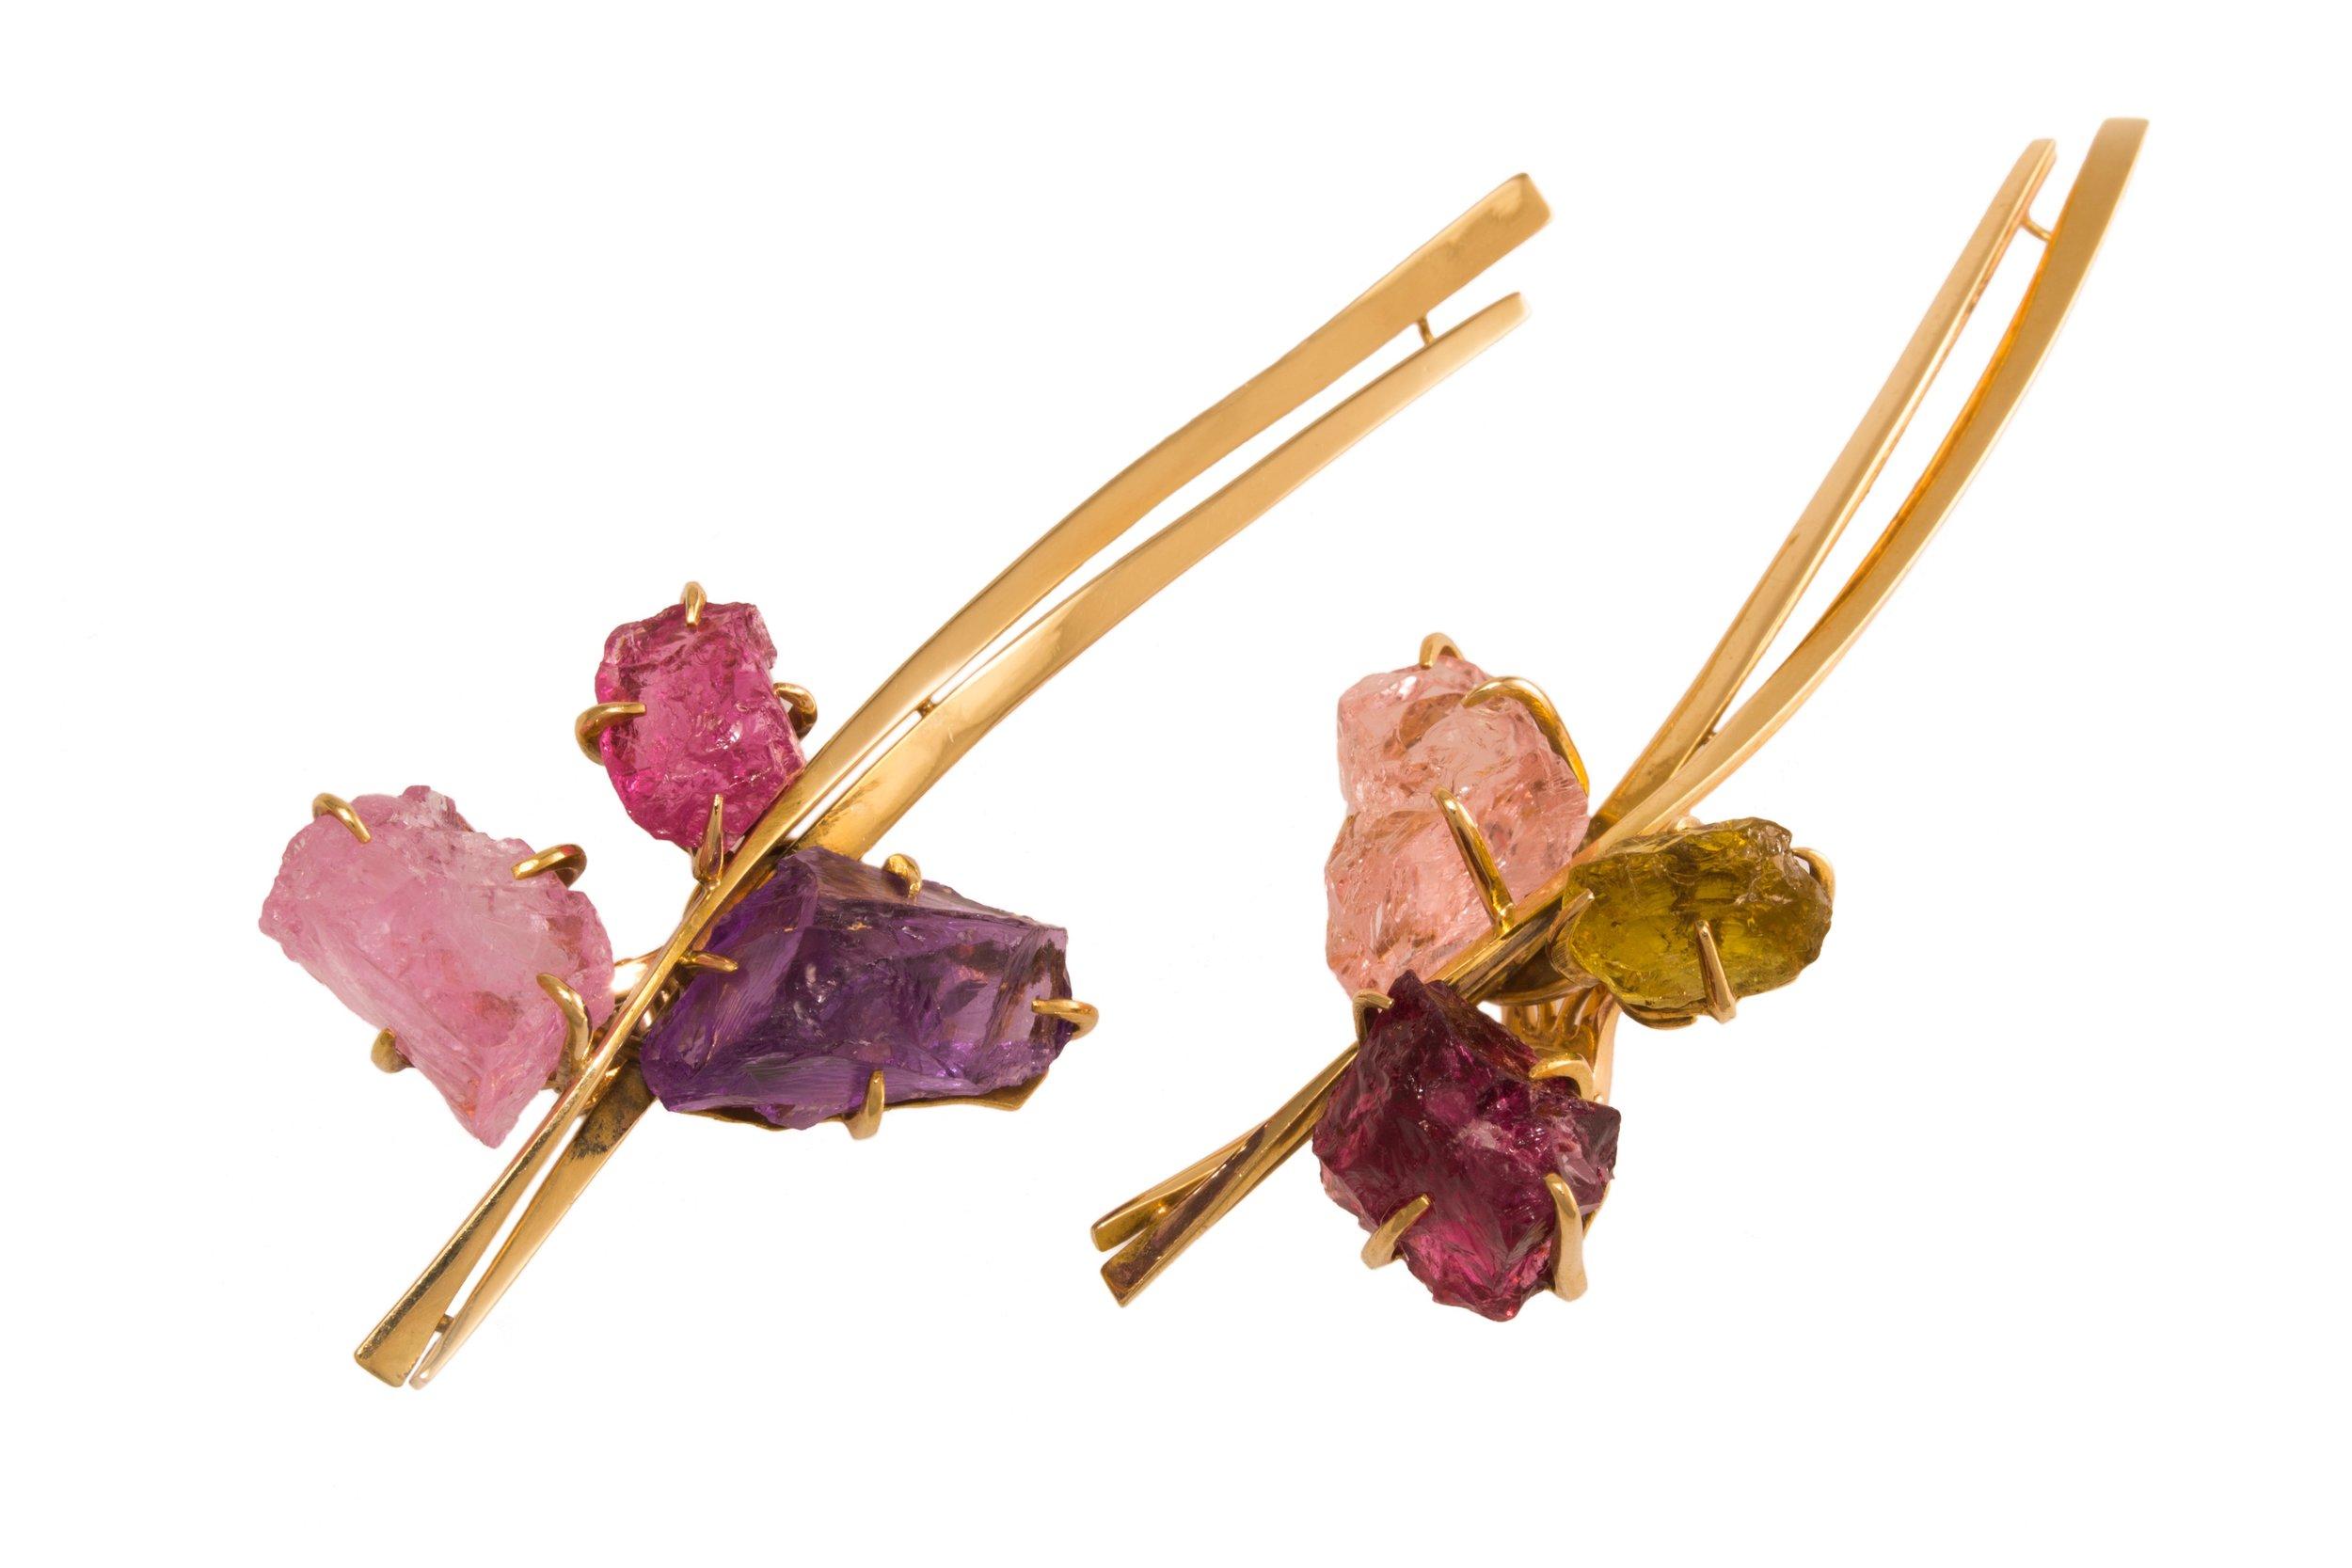 Amethyst, Peridot, Tourmaline and 18k Gold Ear Clips, Dinh Van, c. 1970s